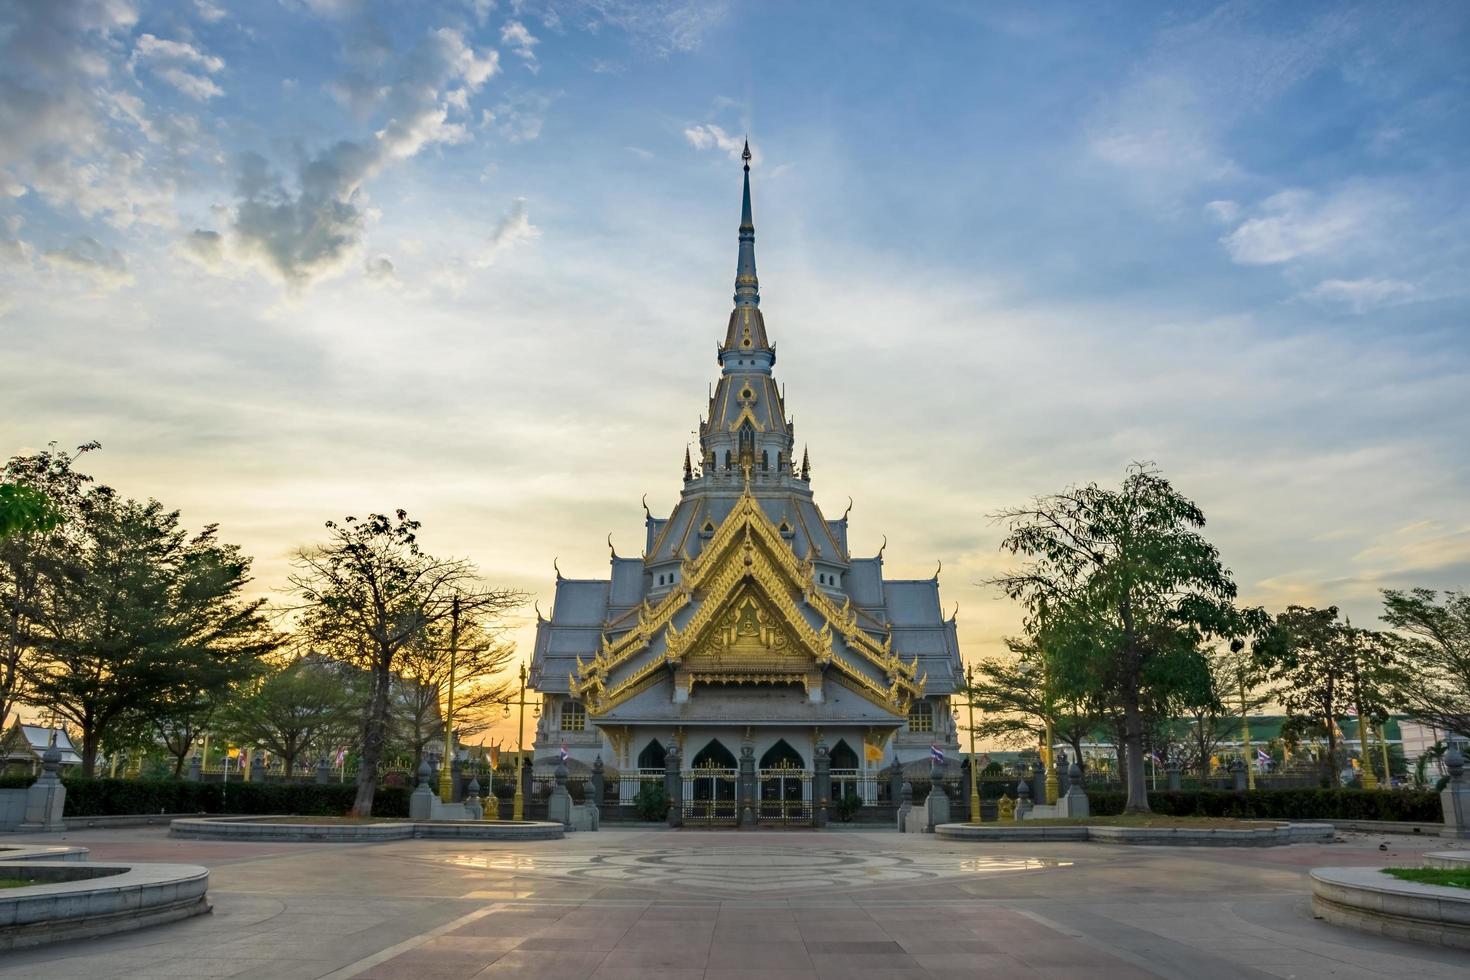 de wat sothon wararam worawihan-tempel in thailand foto